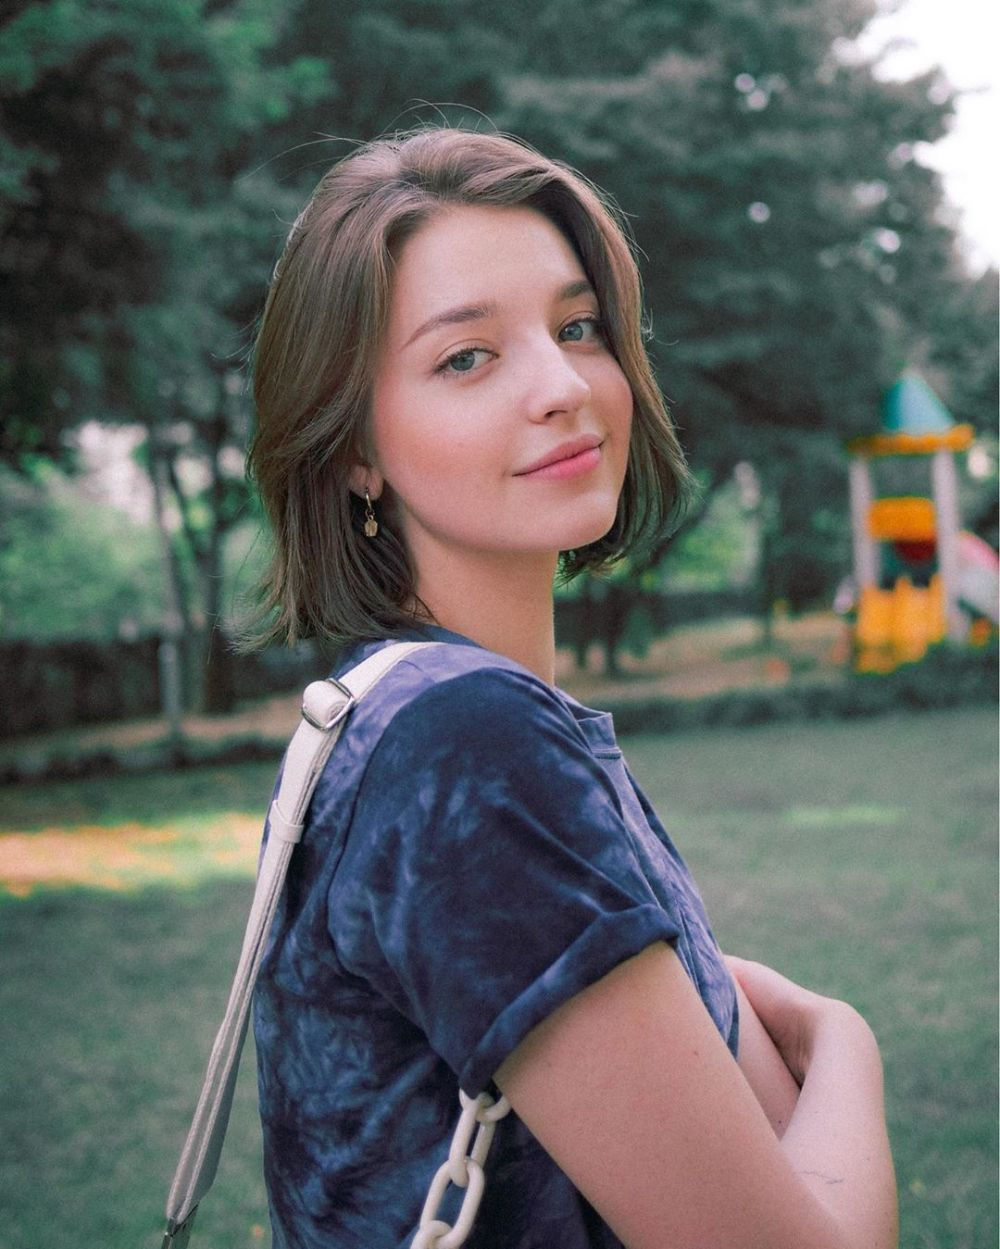 10 Potret Danilova Angelina, Bidadari Rusia yang Berkarier di Korsel!